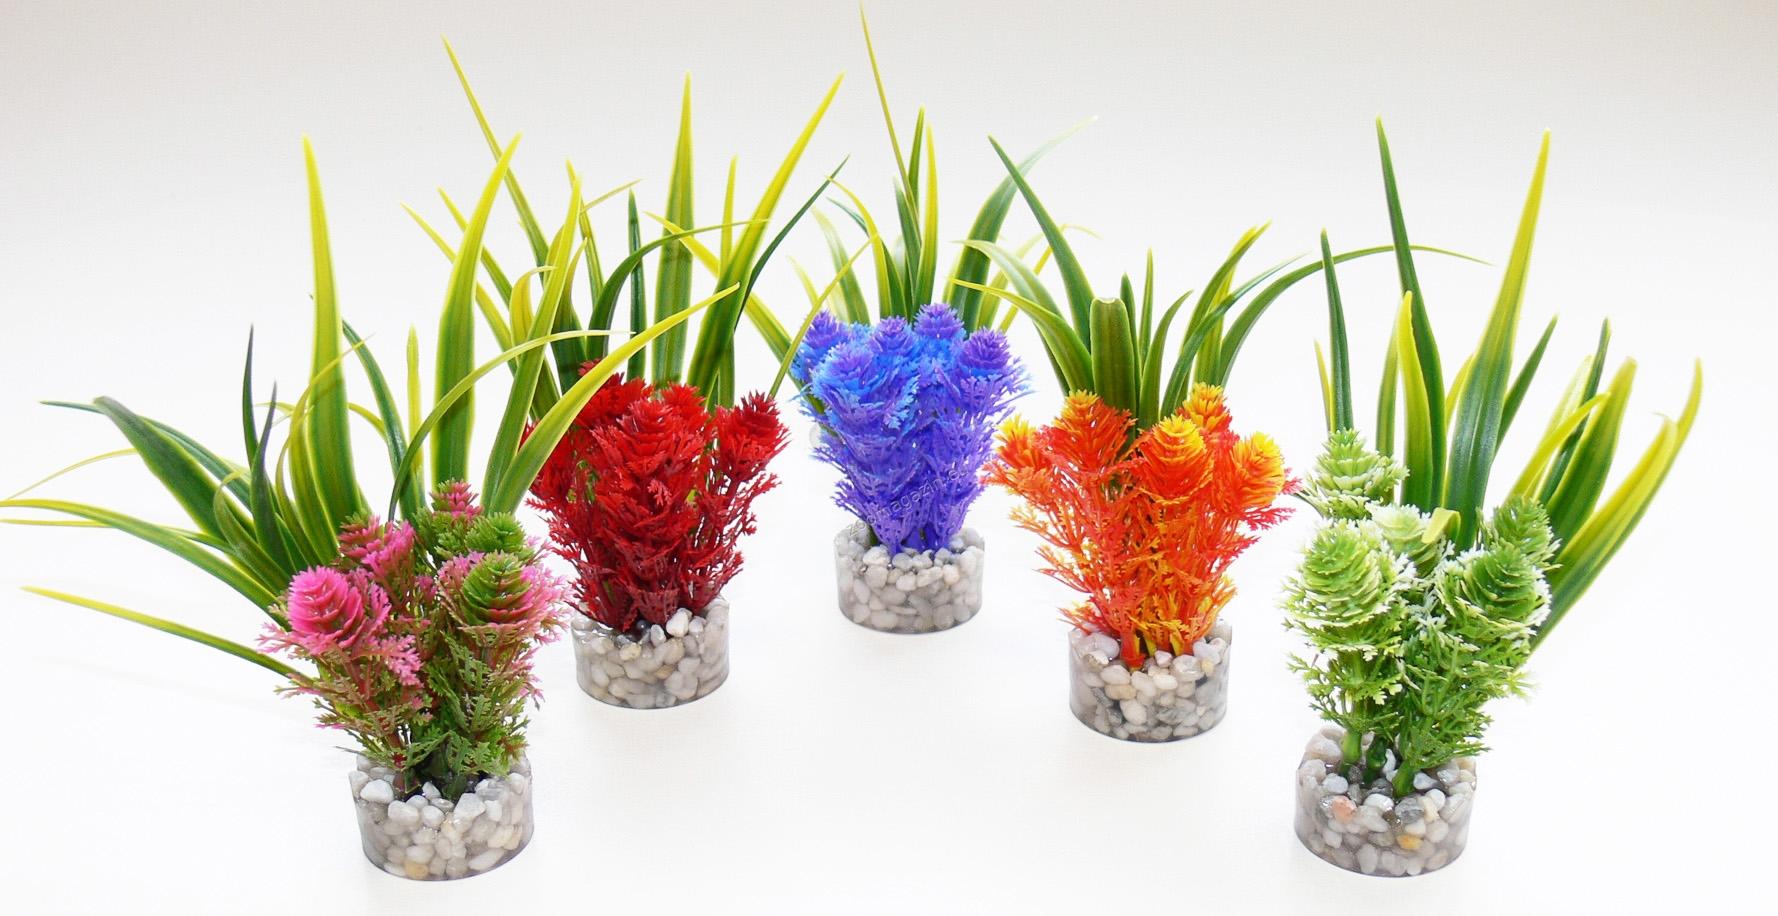 Sydeco Nano Fiesta Flower 14 см. / розово, червено, синьо, оранжево, зелено /